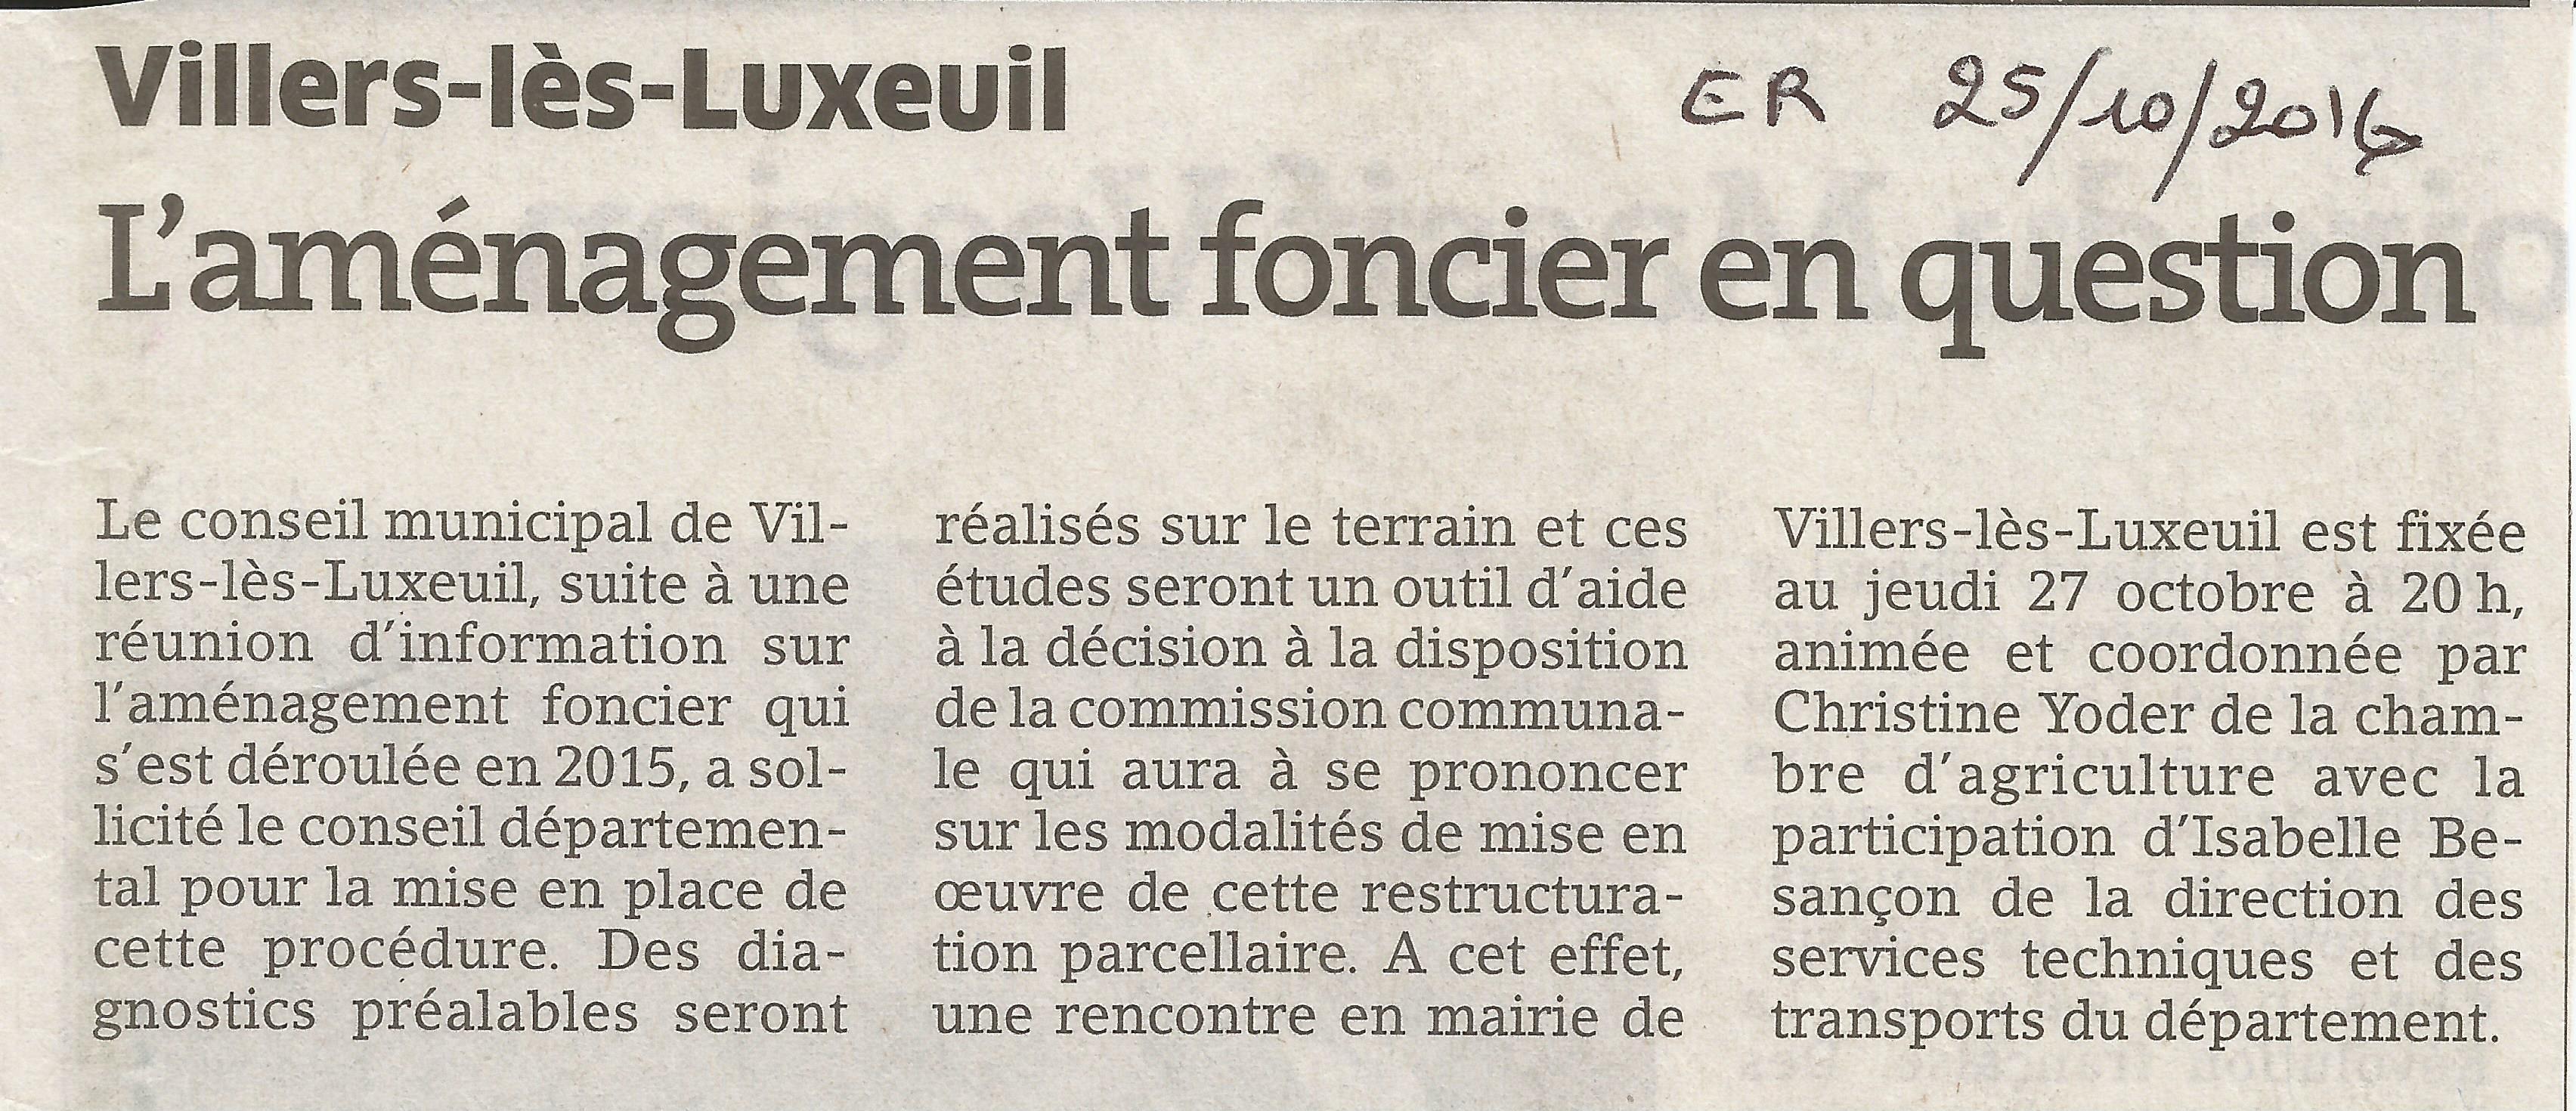 https://www.villers-les-luxeuil.com/projets/villers/files/images/2016_Mairie/Presse/2016_10_25.jpg